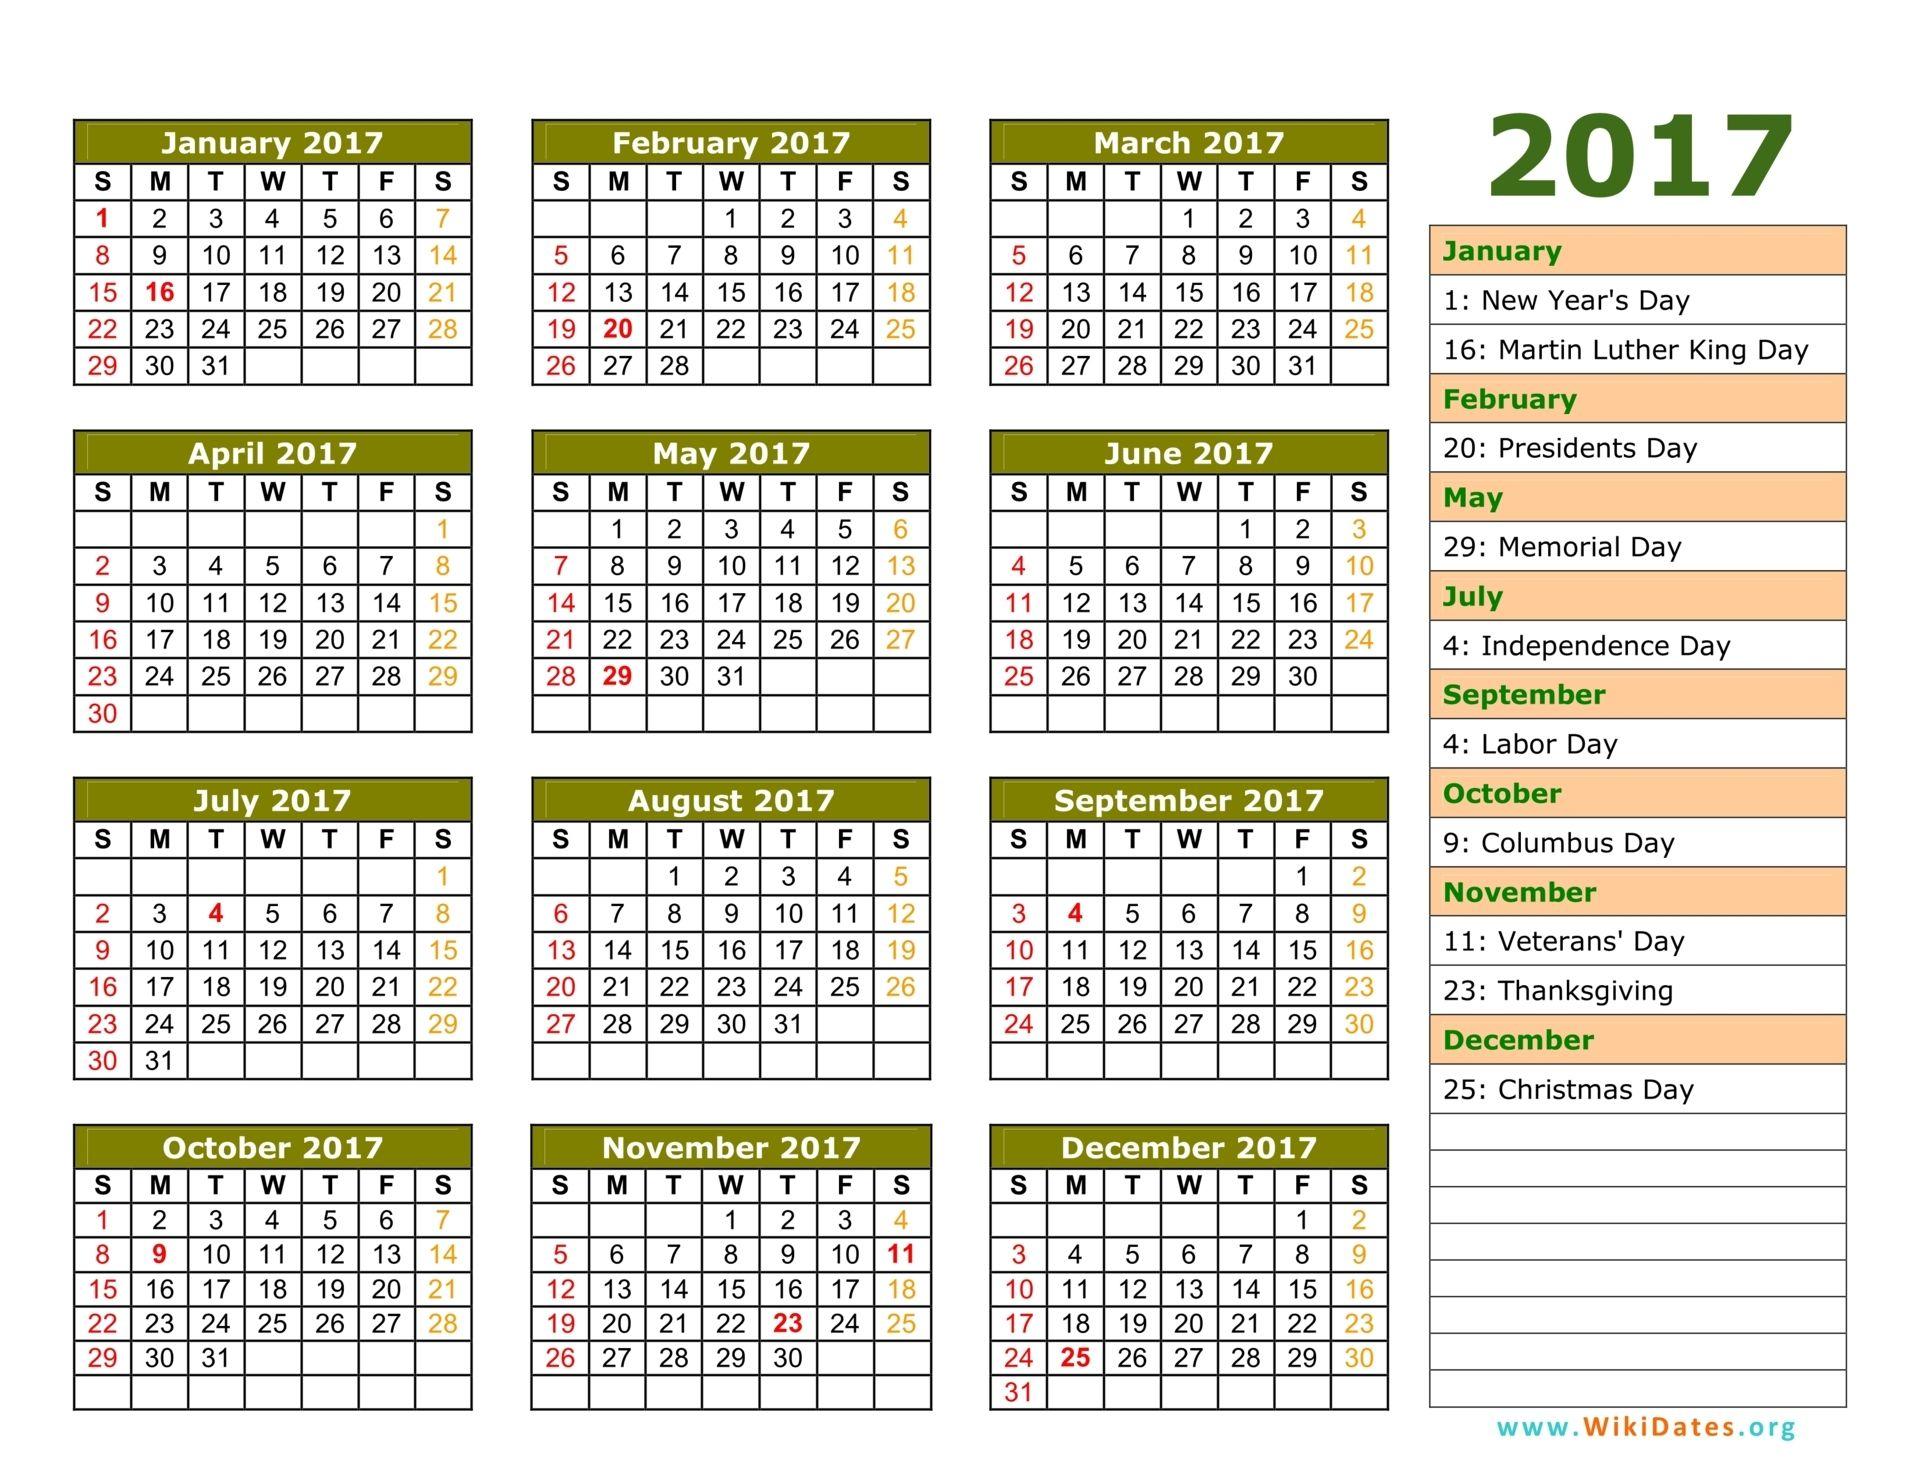 Federal Holiday Calendar 2017 - Academic Calendar